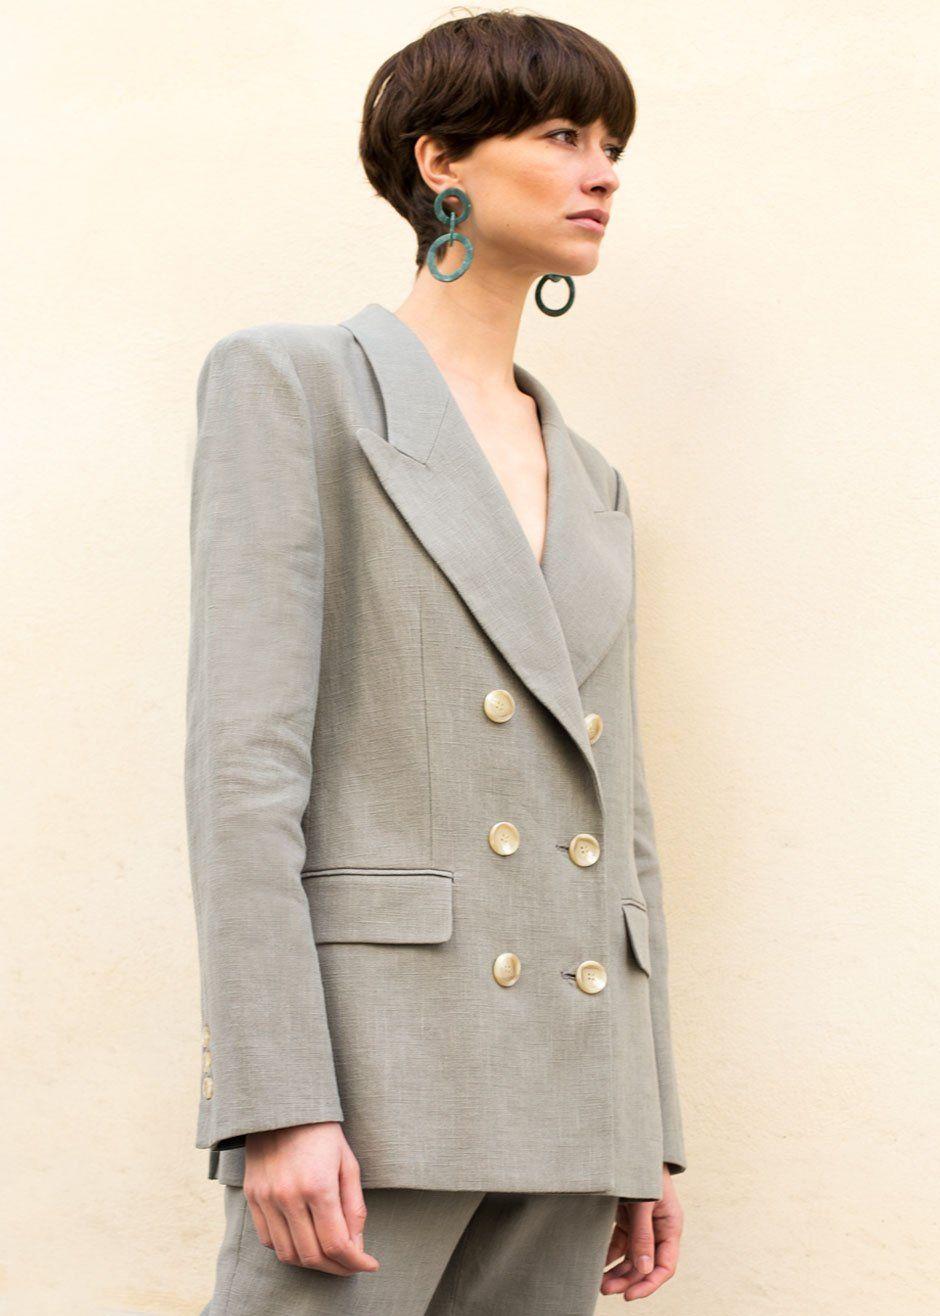 0c49c4e7cc  newarrivals  Linen  Sage  Grey  Blazer  Suit  thefrankieshop  frankiegirl  Sage Grey Peak Lapel Blazer – The Frankie Shop